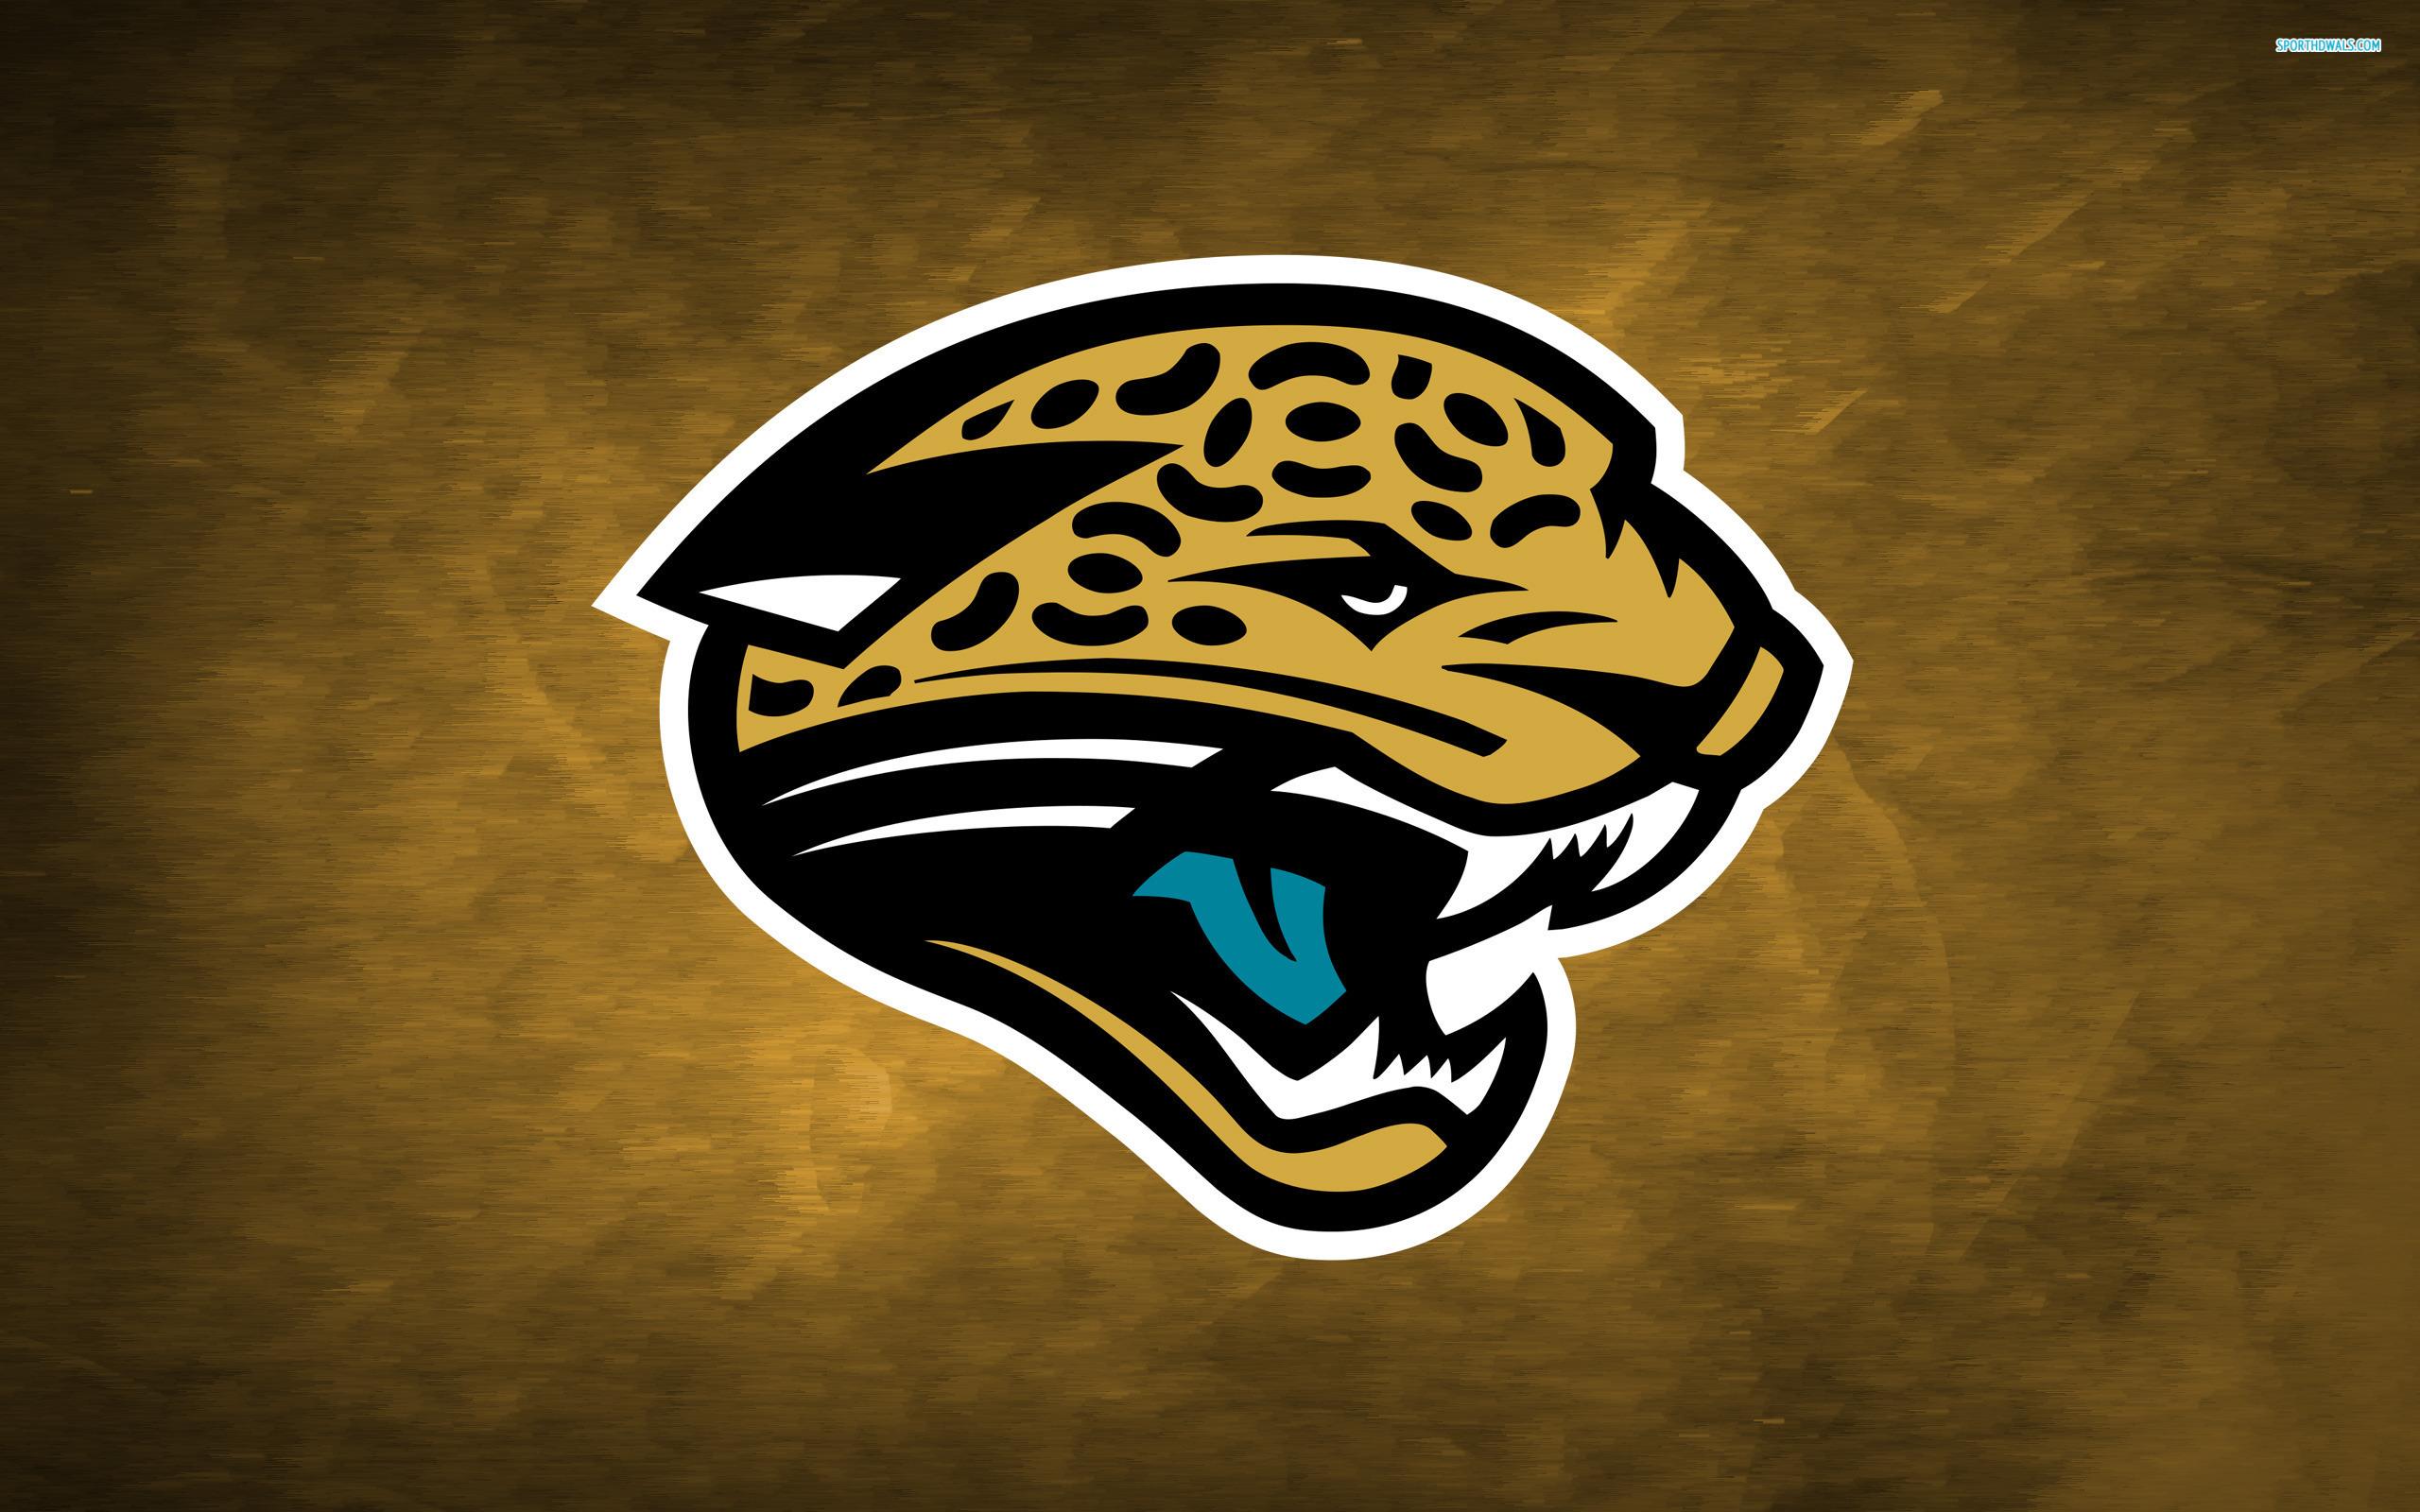 jacksonville jaguars wallpaper 2560x1440 69361